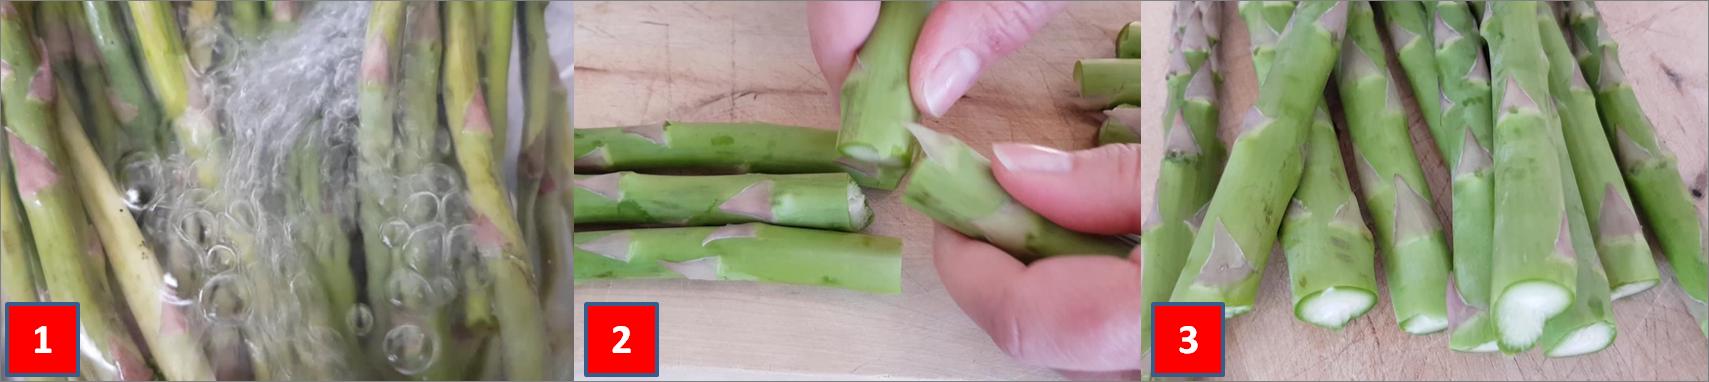 ricetta passo passo frittatine di asparagi 1